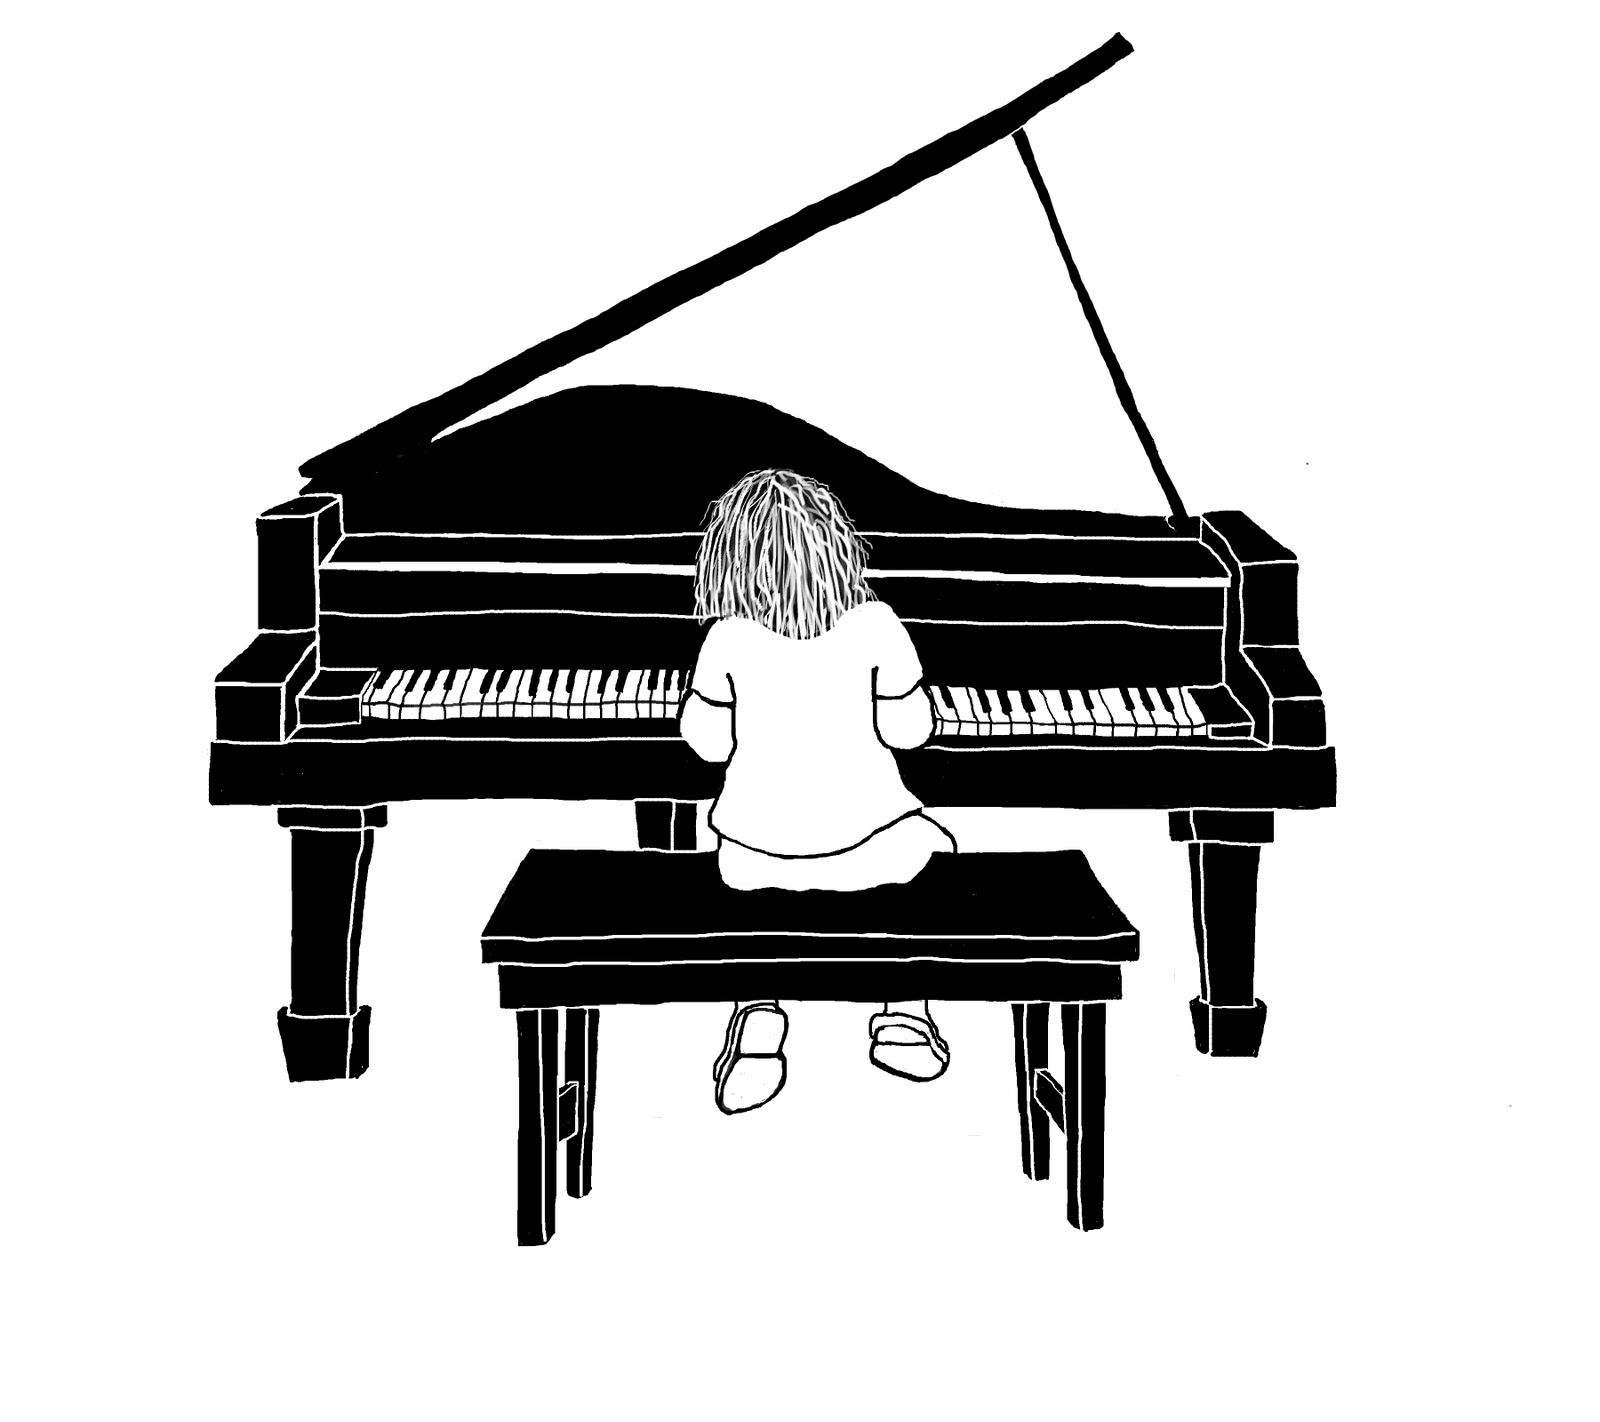 piano drawings - Google Search in 2019 | Klavier ...